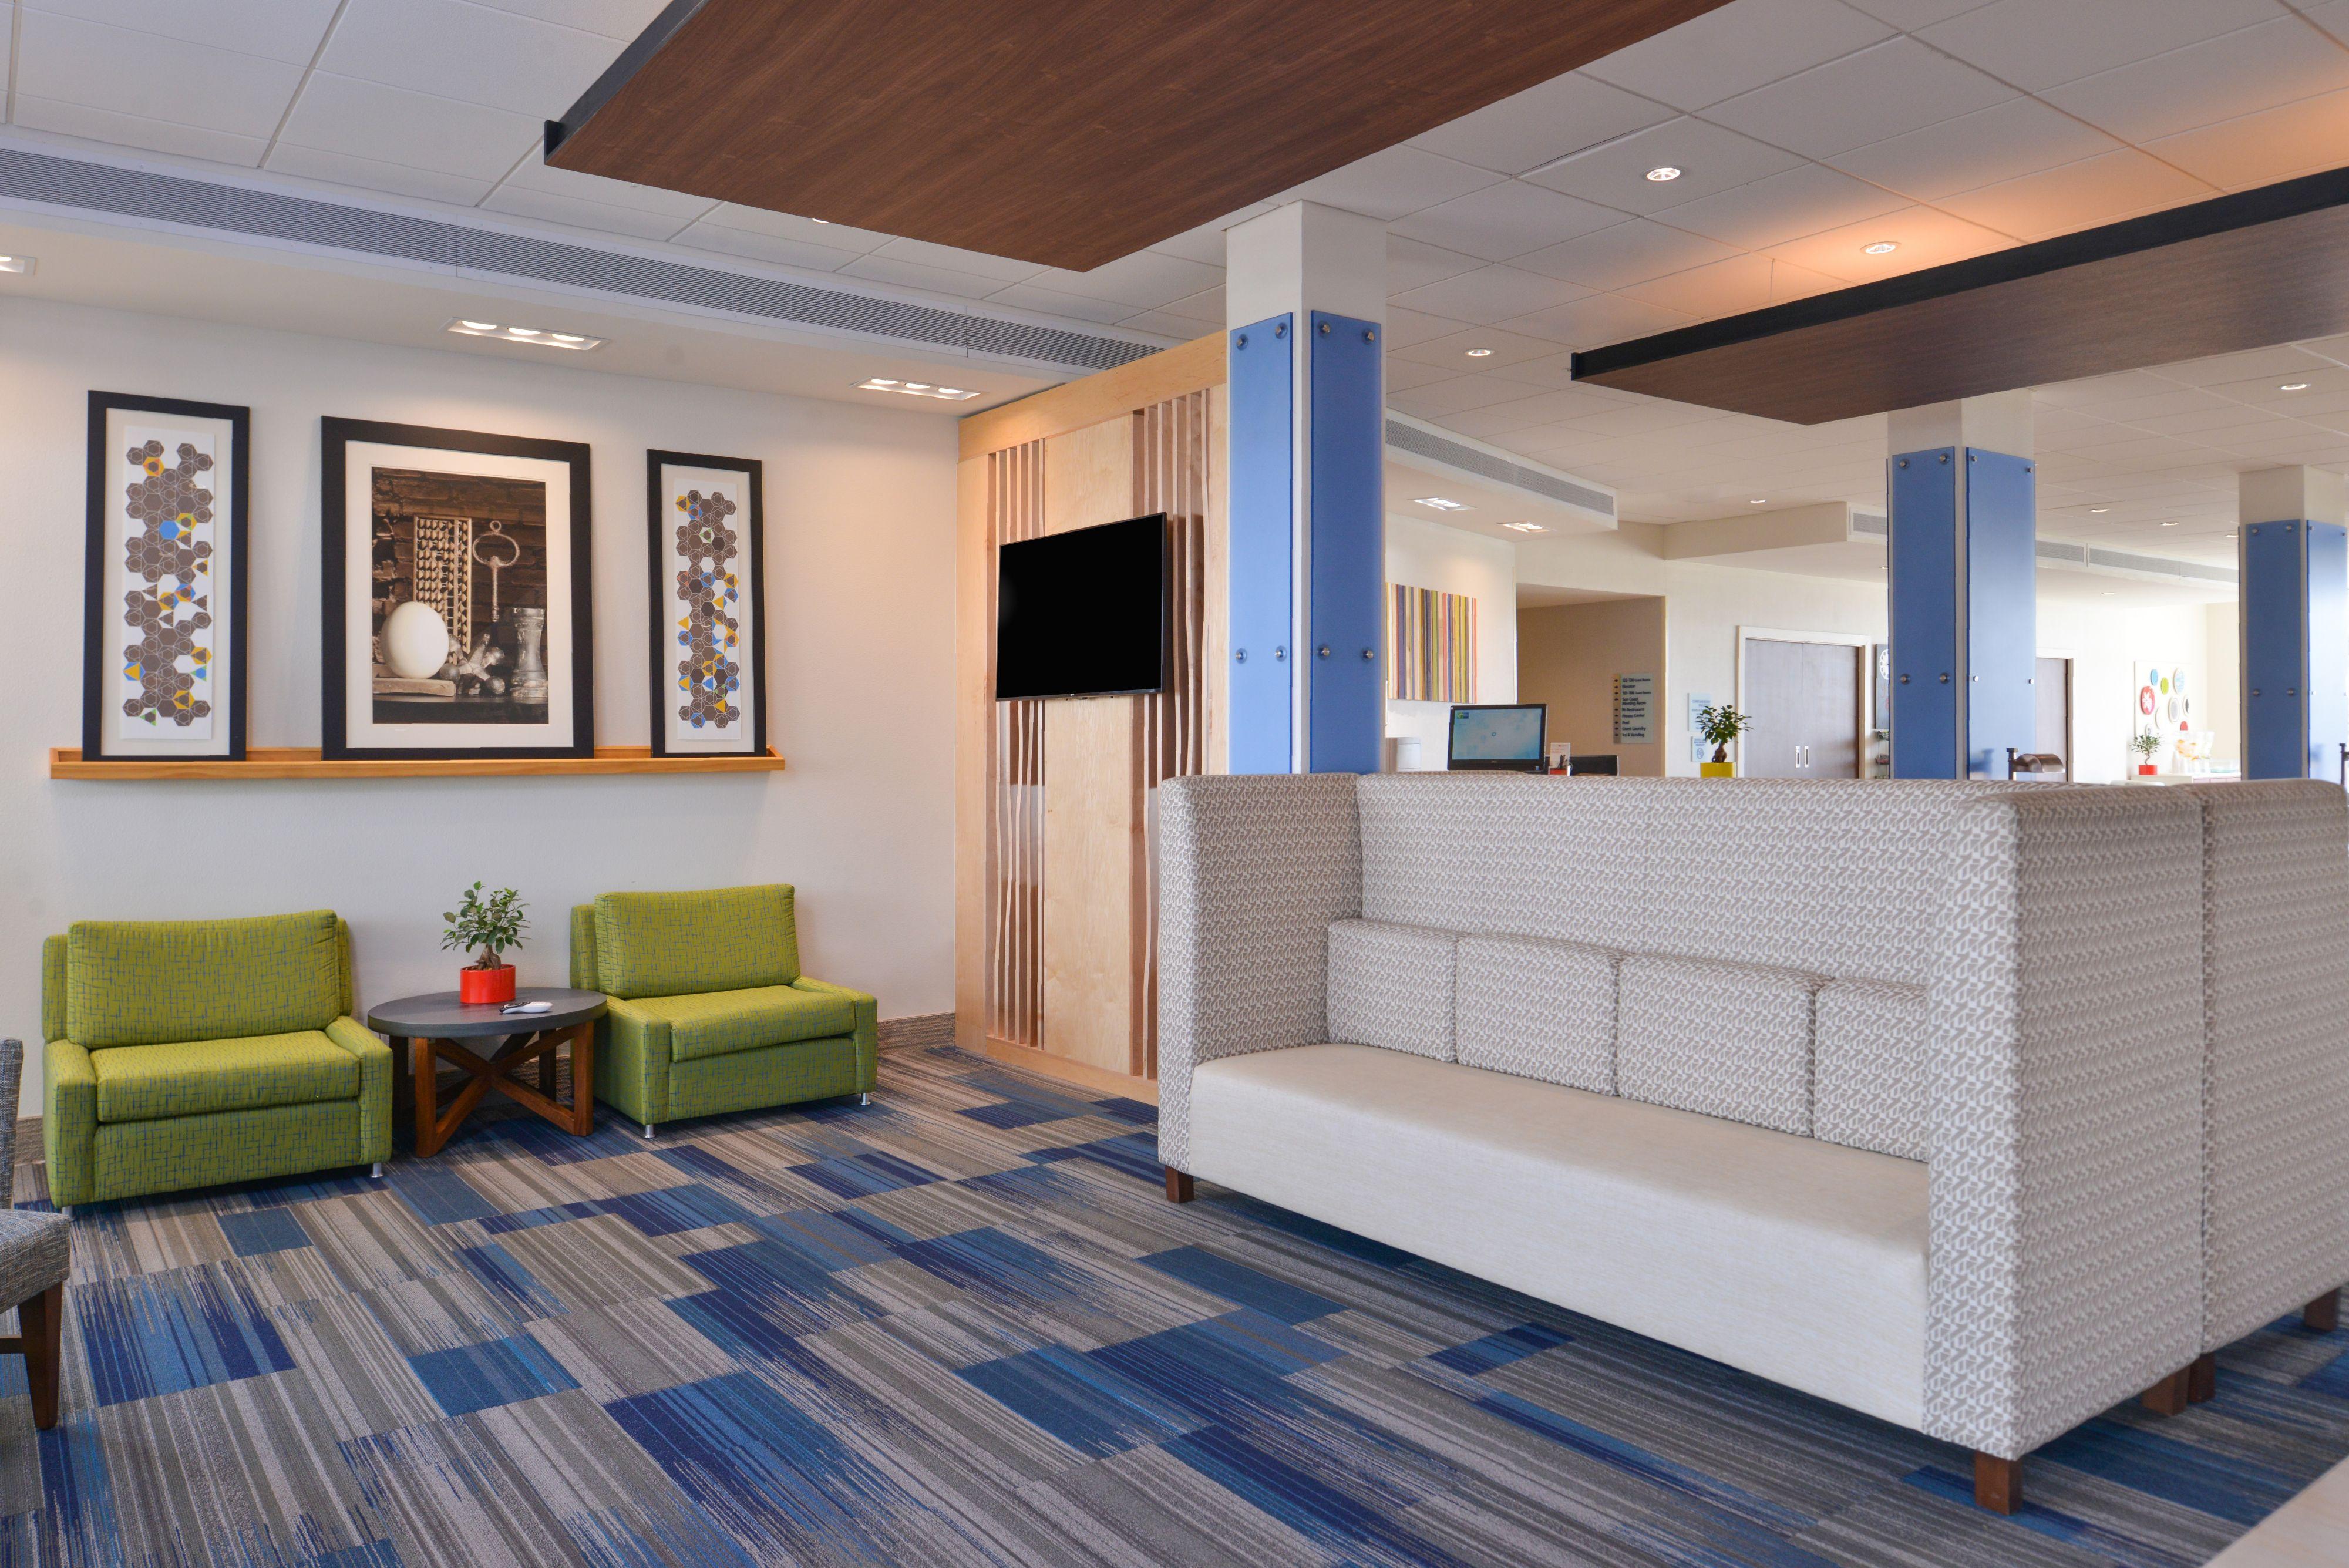 Holiday Inn Express Amp Suites Trinity Trinity Florida Fl